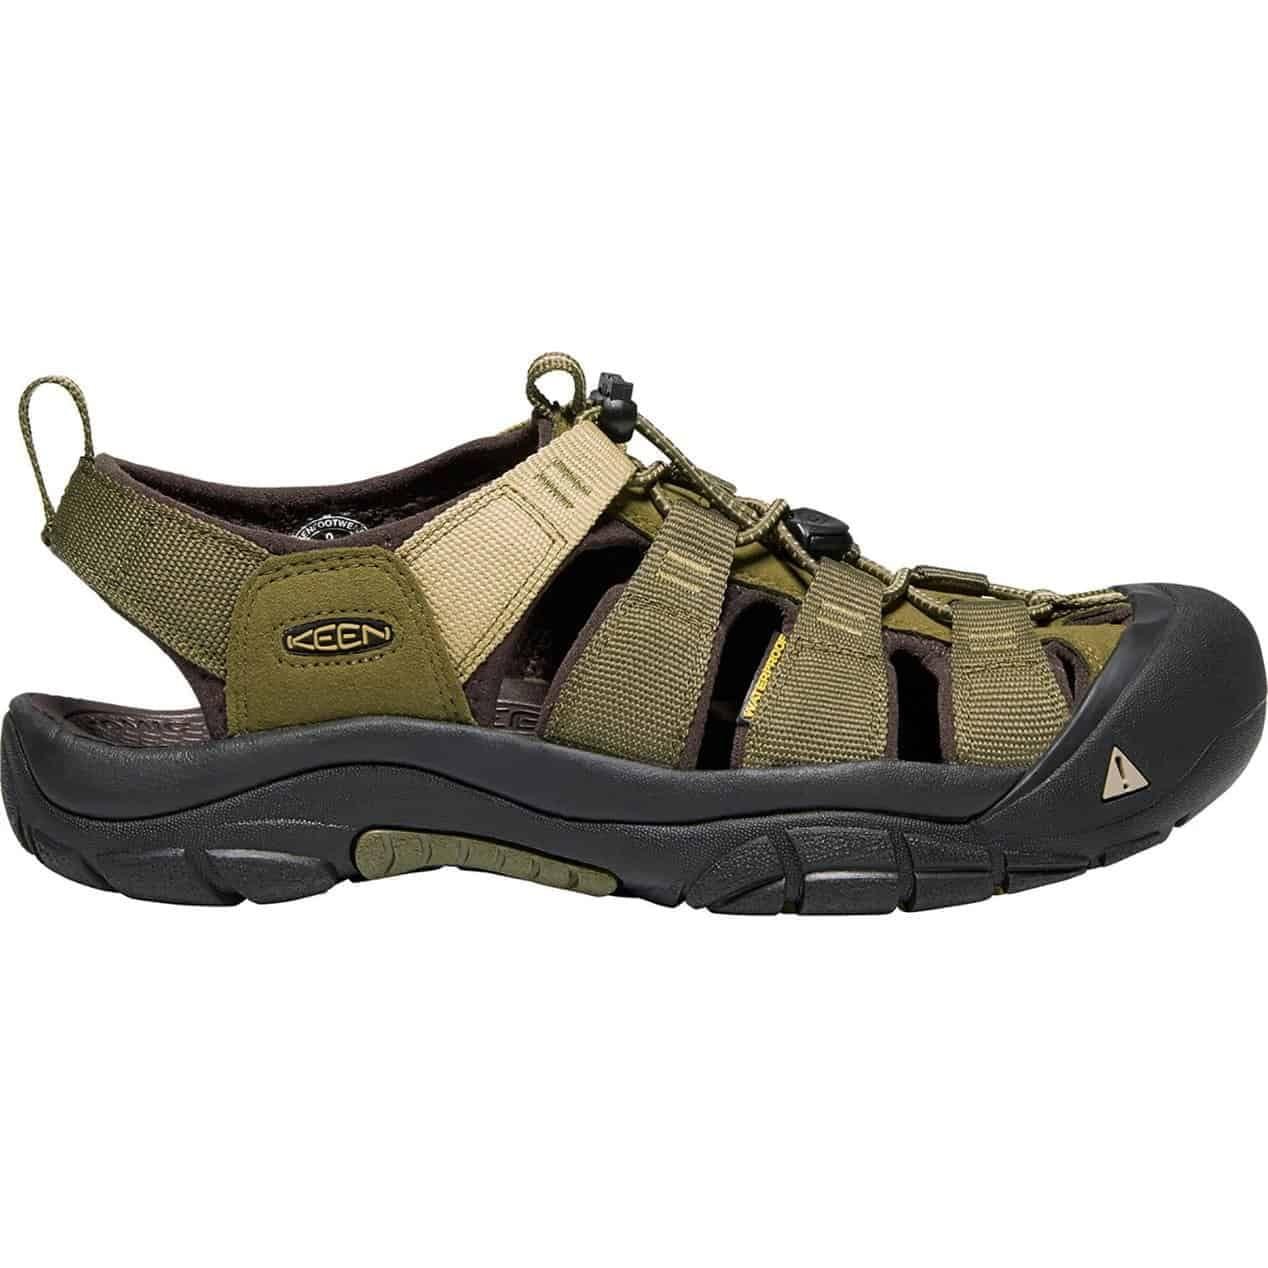 keen mens newport hydro sandal